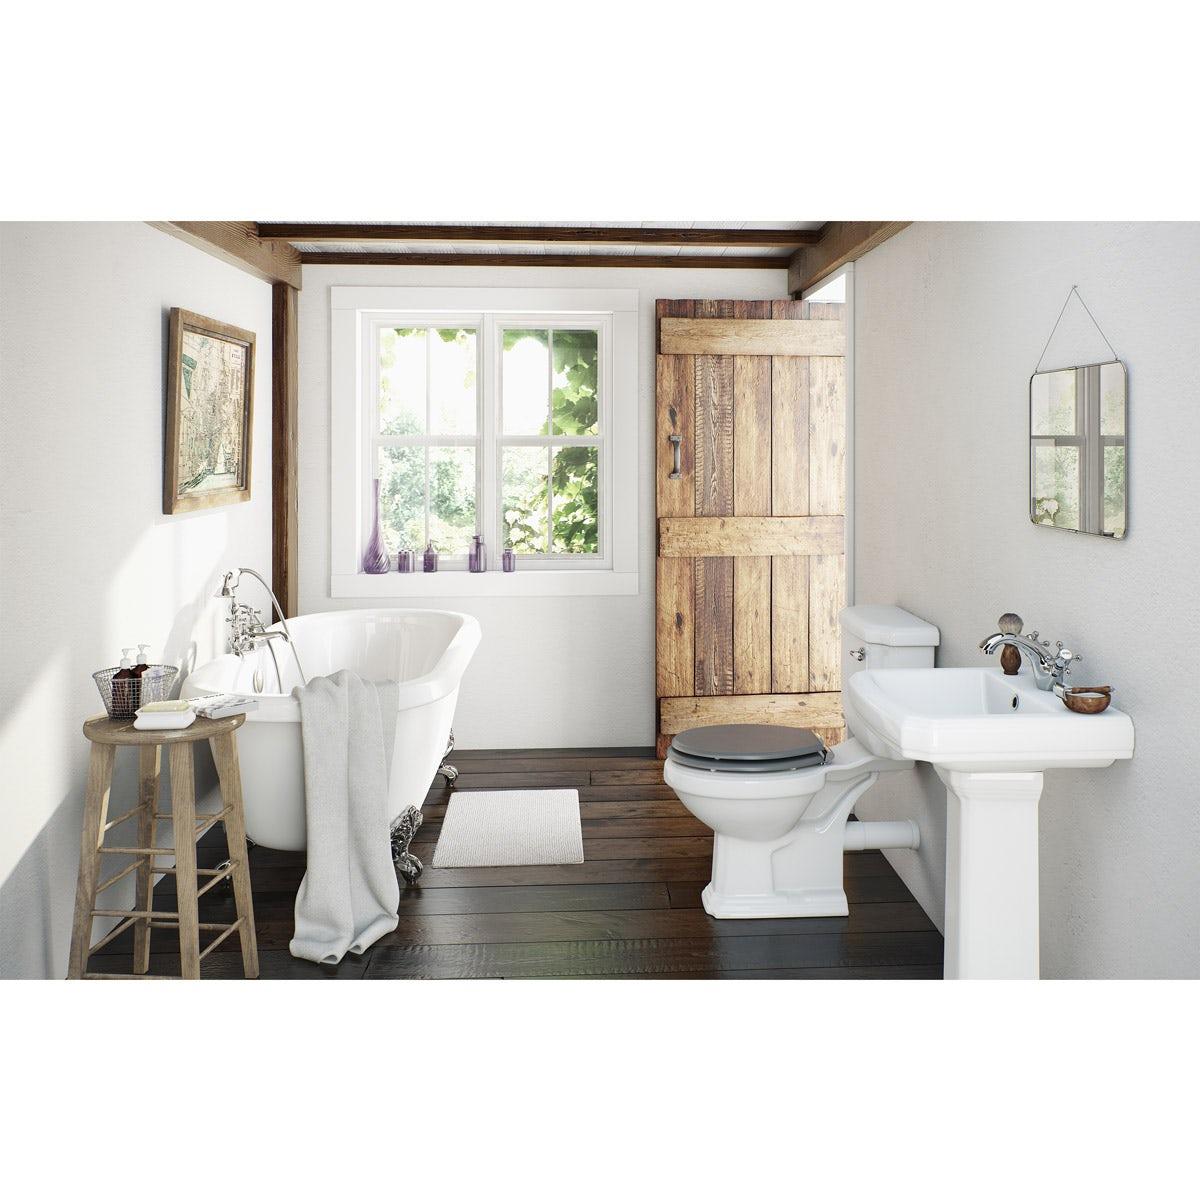 The Bath Co. Dulwich grey bathroom suite with roll top bath